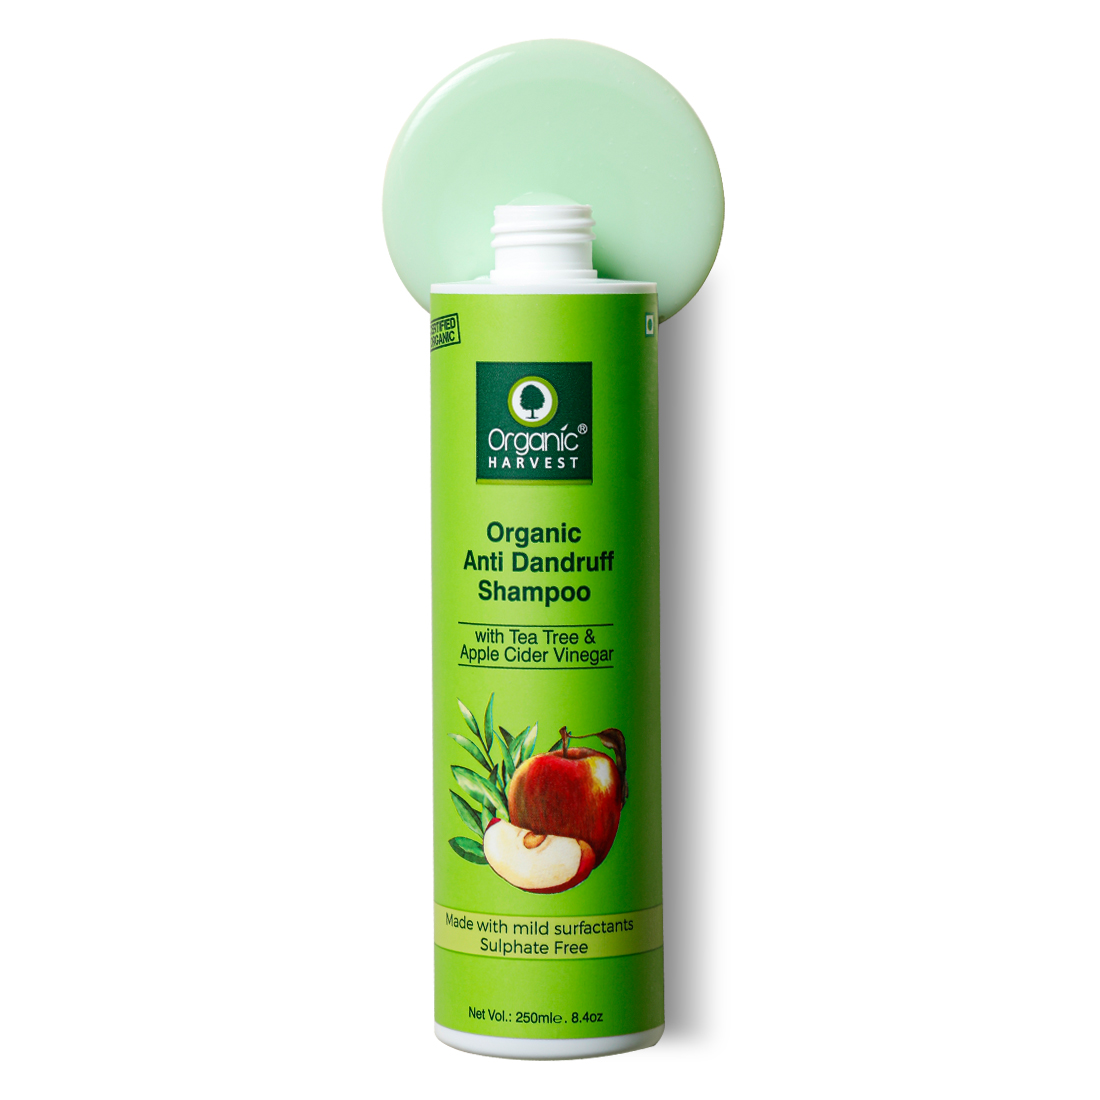 Organic Harvest | Organic Harvest Apple Cider Vinegar & Tea Tree Oil Anti Dandruff Shampoo, Sulphate And Paraben Free Shampoo, for Itchy and Dry Scalp, 250 ml